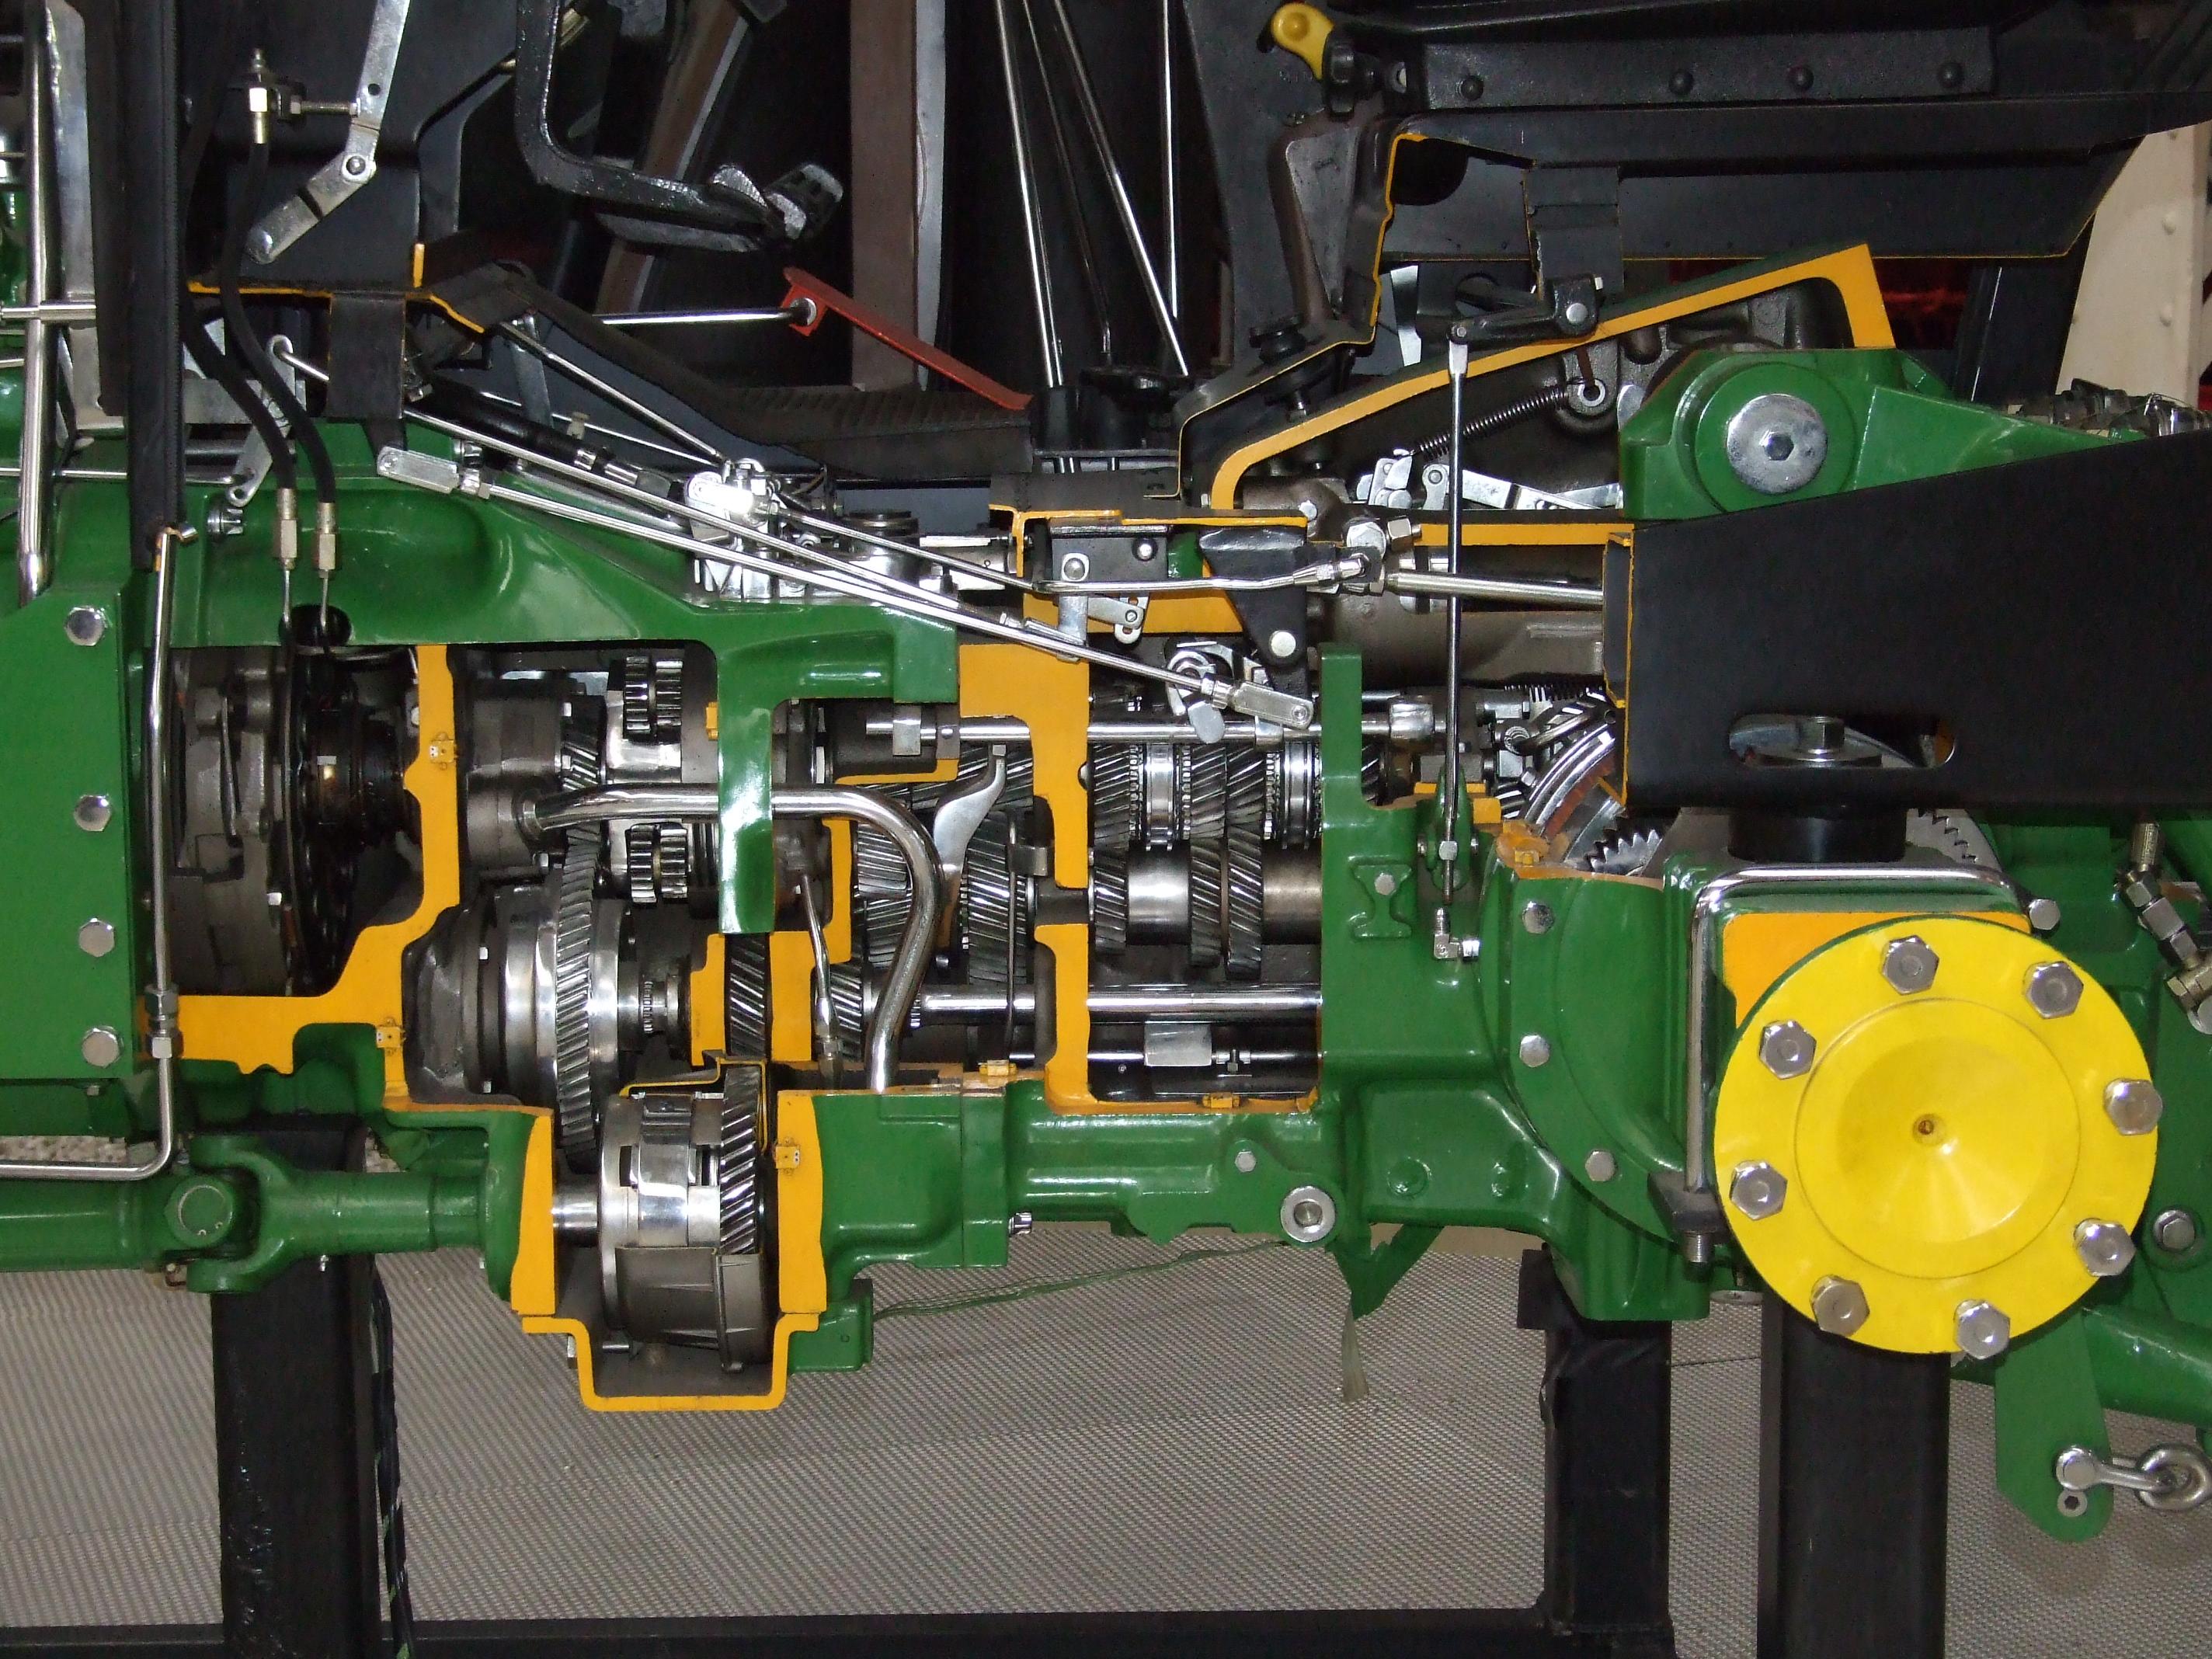 John Deere Cvt Transmission Gator Hpx 4x4 Wiring Diagram D105 Problem Automatic Review